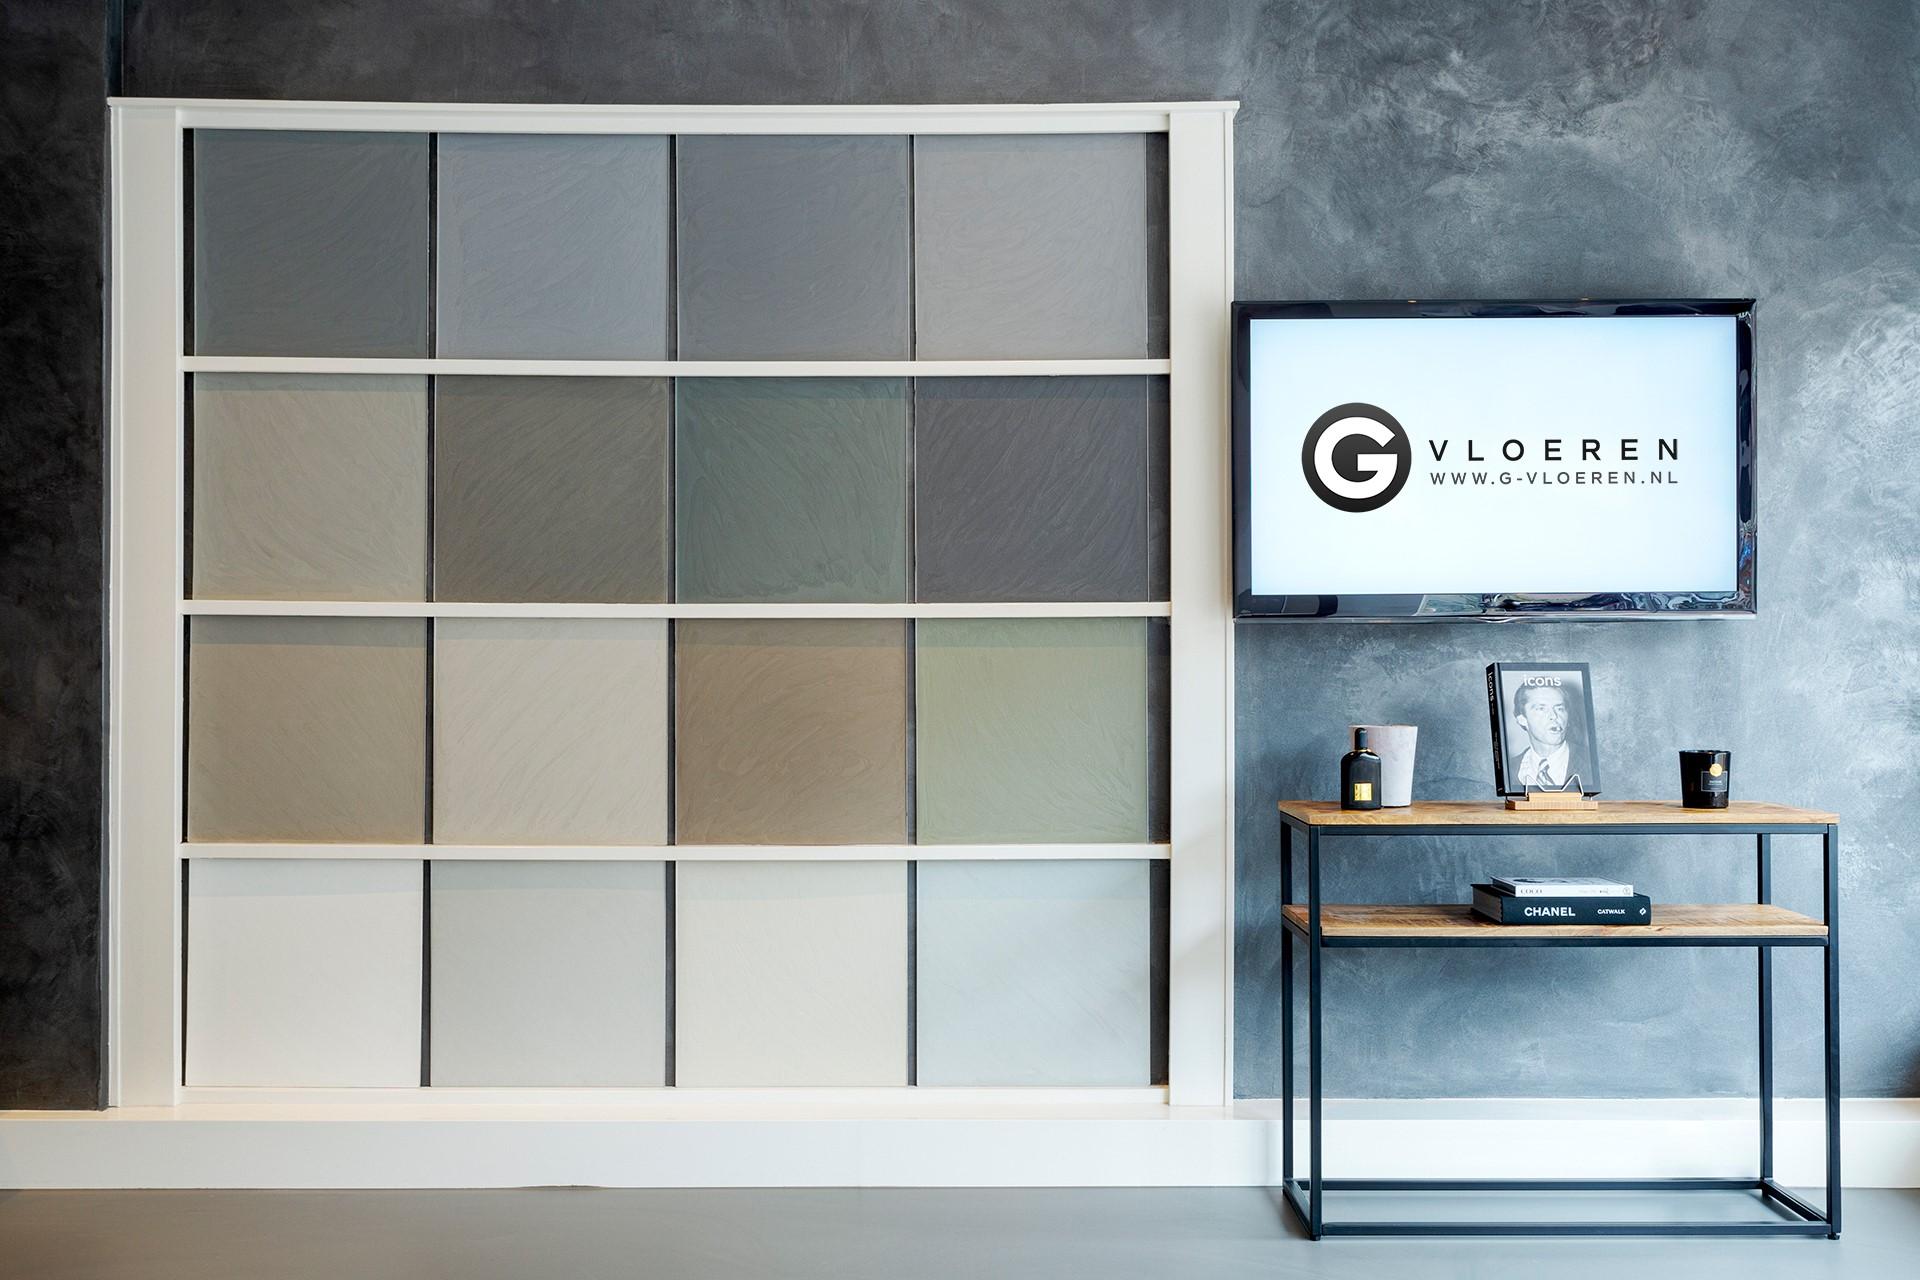 G-vloeren samples showroom